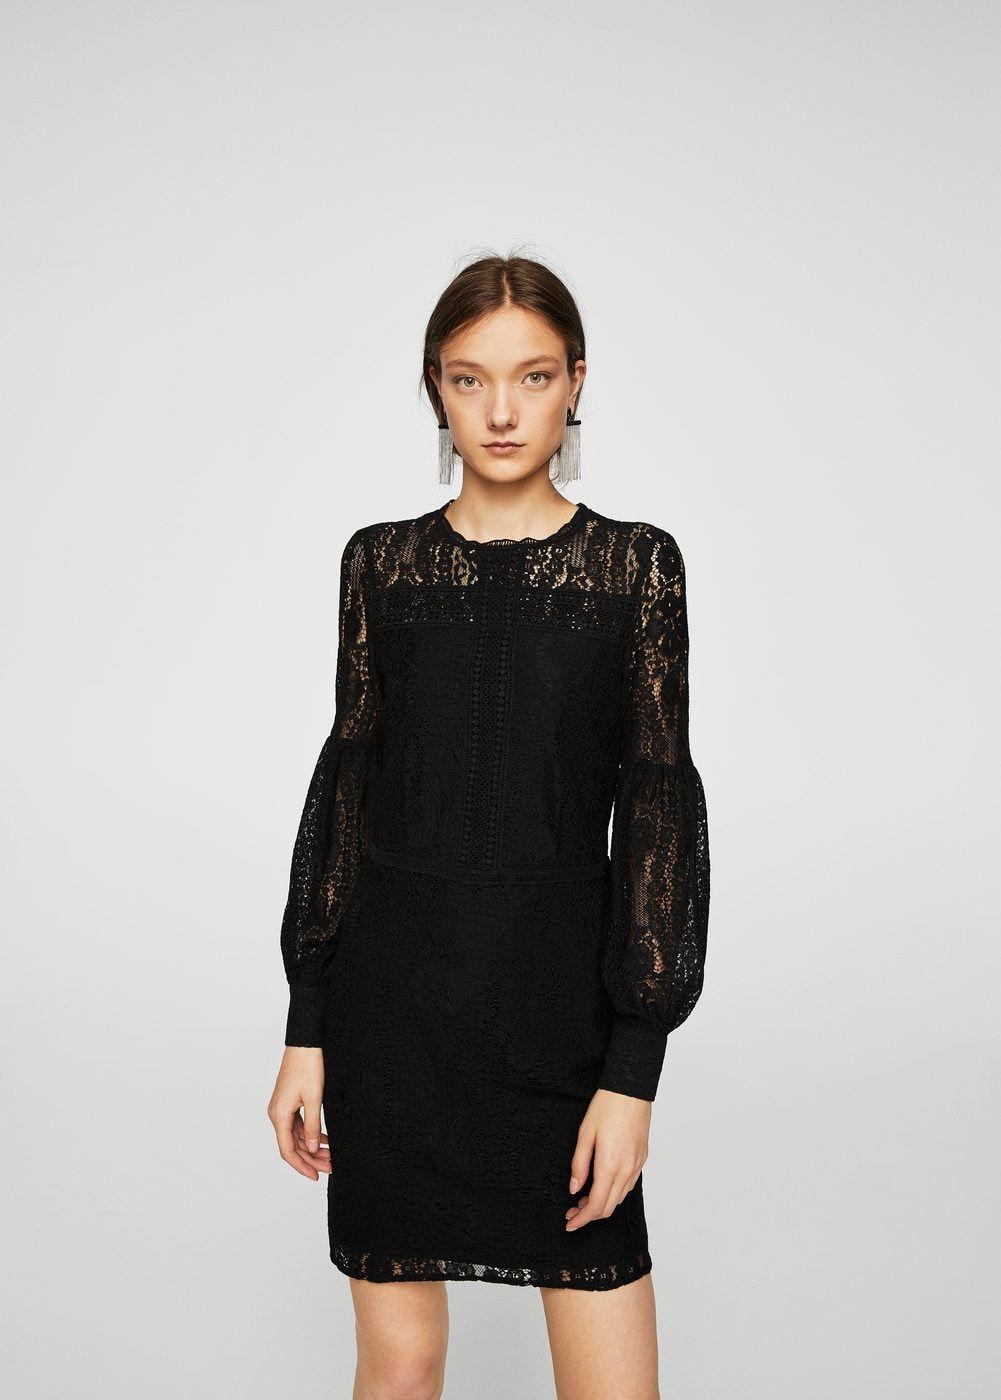 Robe Femme Manches ♡ Mode Bouffantes Guipure zSwSgqr07